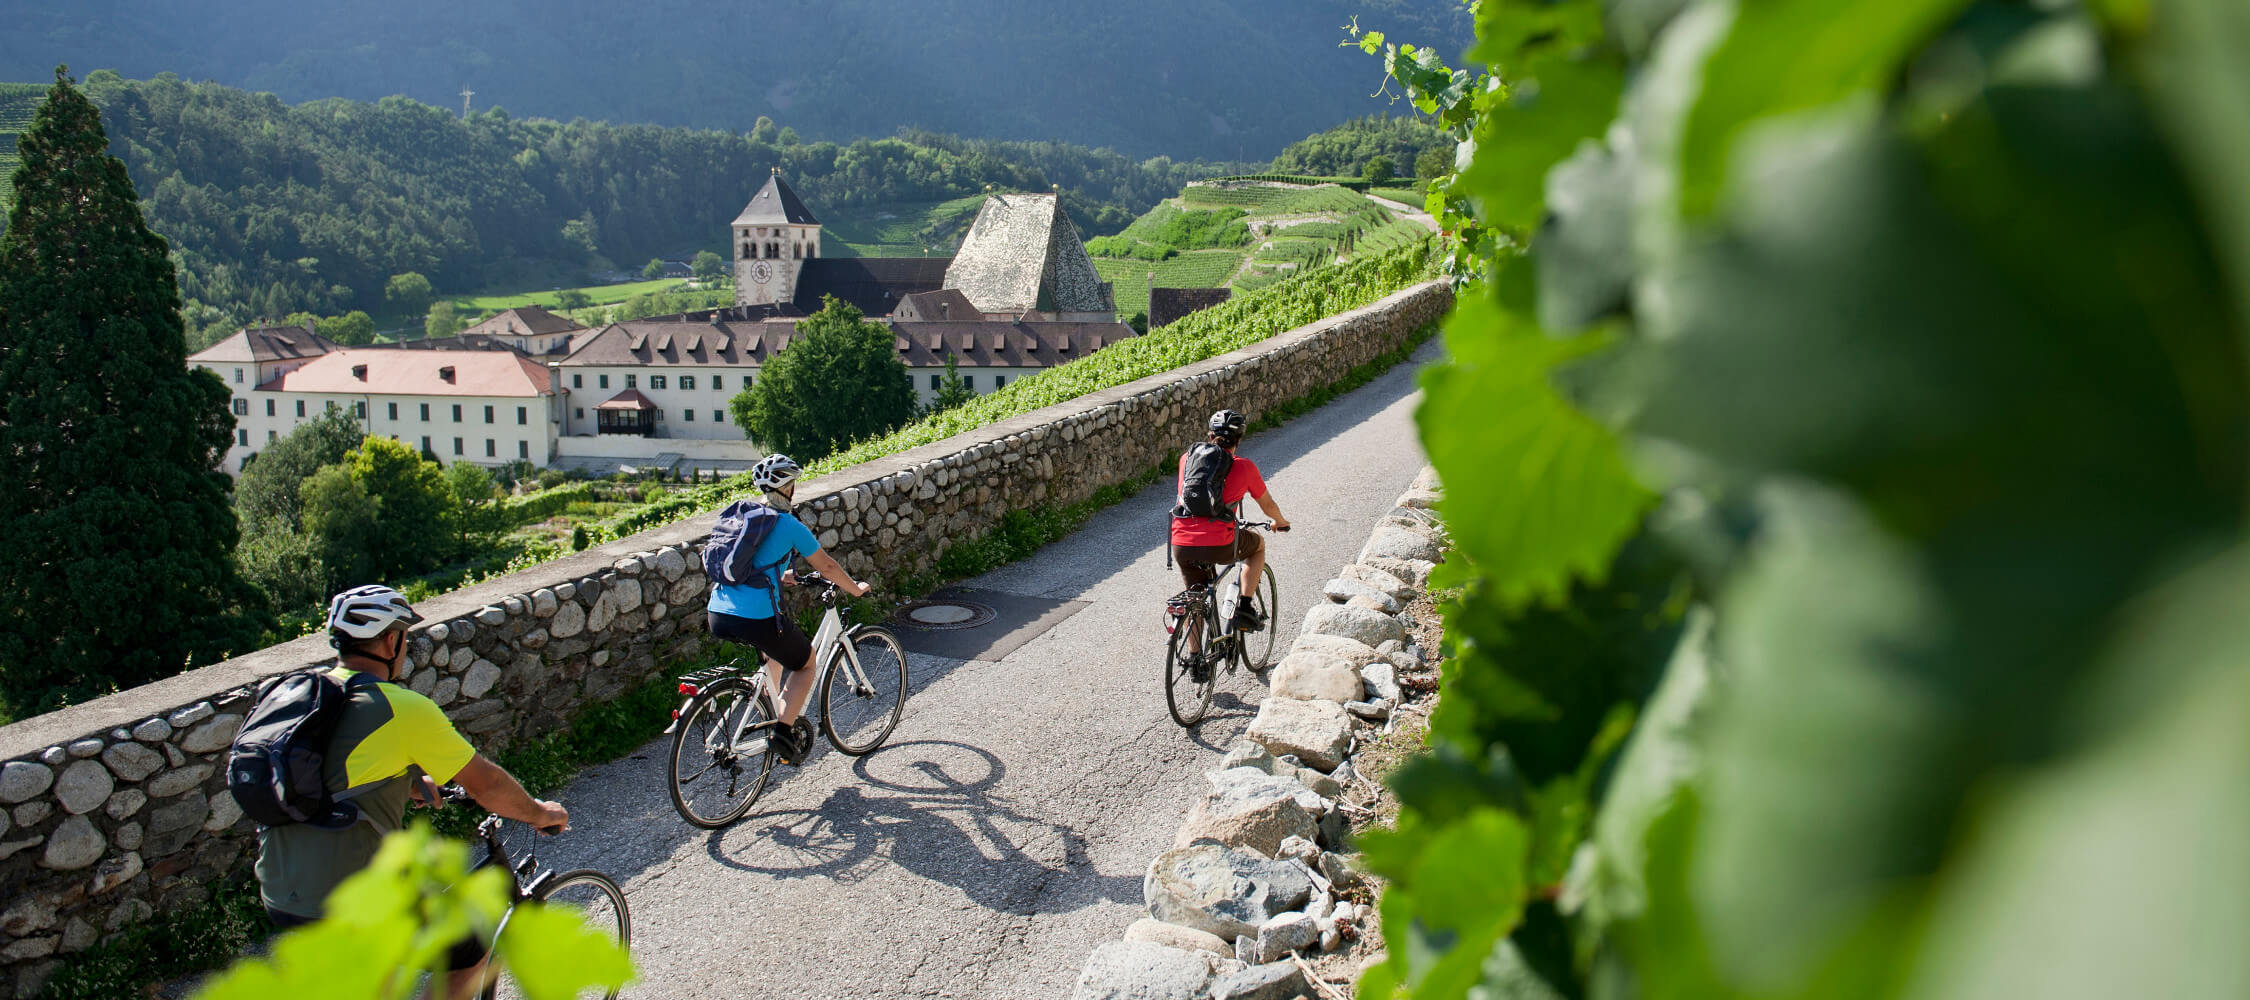 Italien-Trentino_Suedtirol_Alto_Adige_Merano_Meran_Natur_Sport_Sommer_Fahrrad_IDM-Alex-Filz_smg02204alfi_2250x1000